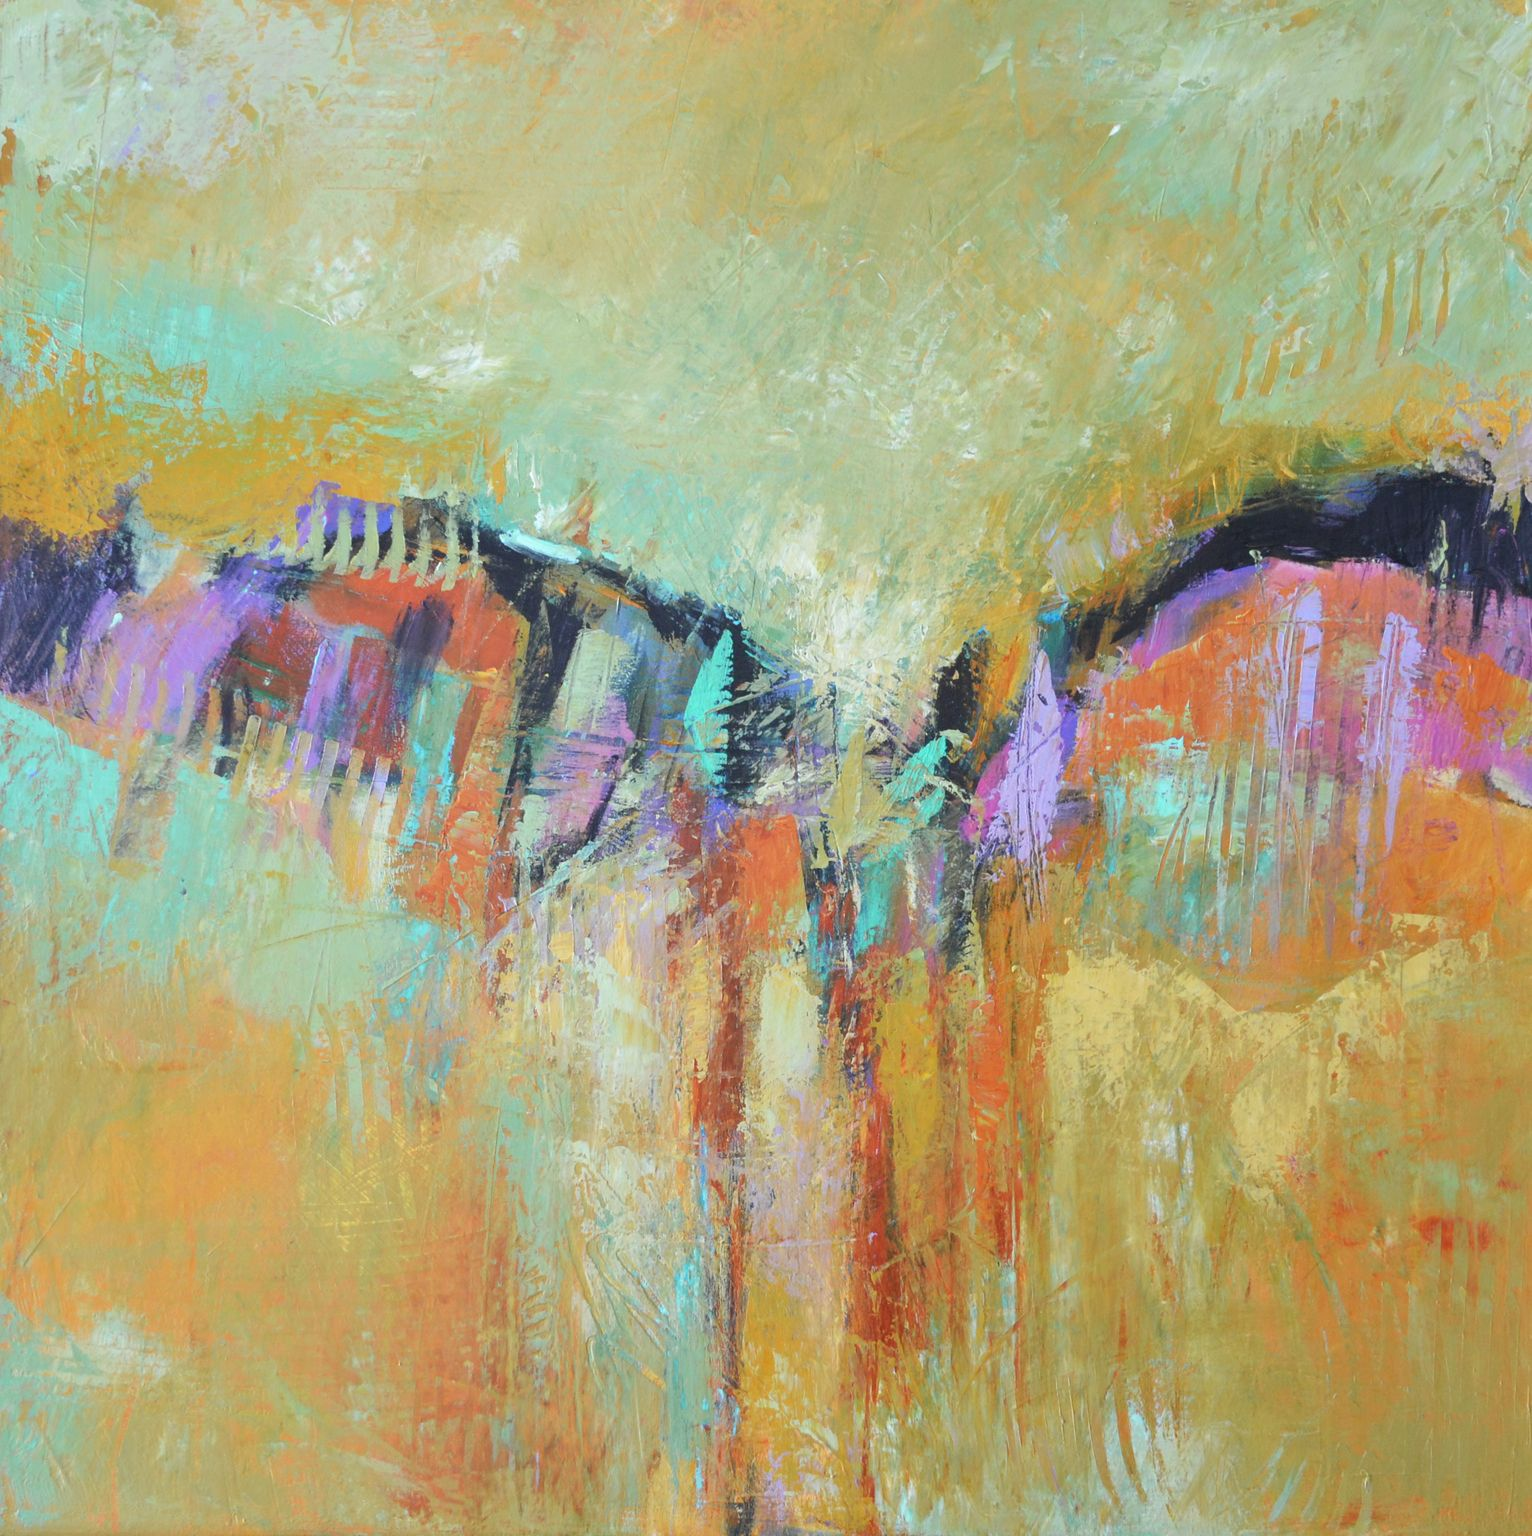 "'Firebird' by Filomena  Booth | $1000 | 24""W x 24""H x 1.5""D | Original Art | http://vng.io/l/7hmOvD-9c_ @VangoArt"